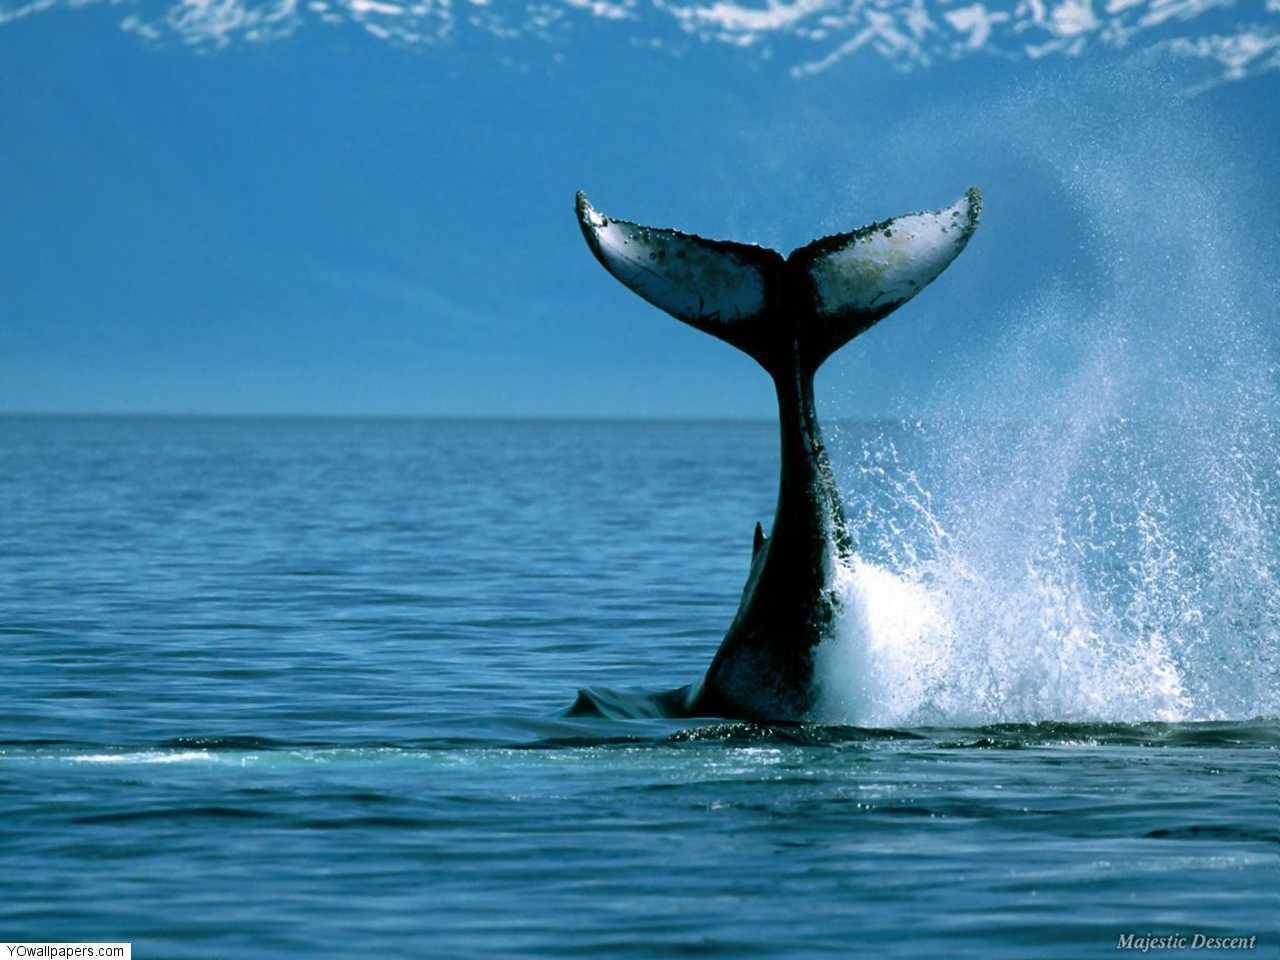 http://3.bp.blogspot.com/_enVLP57PrXw/TB8Z8fAc-iI/AAAAAAAAB1A/vXIU62I8pQQ/s1600/Ocean-Wallpaper-+_8_.jpg